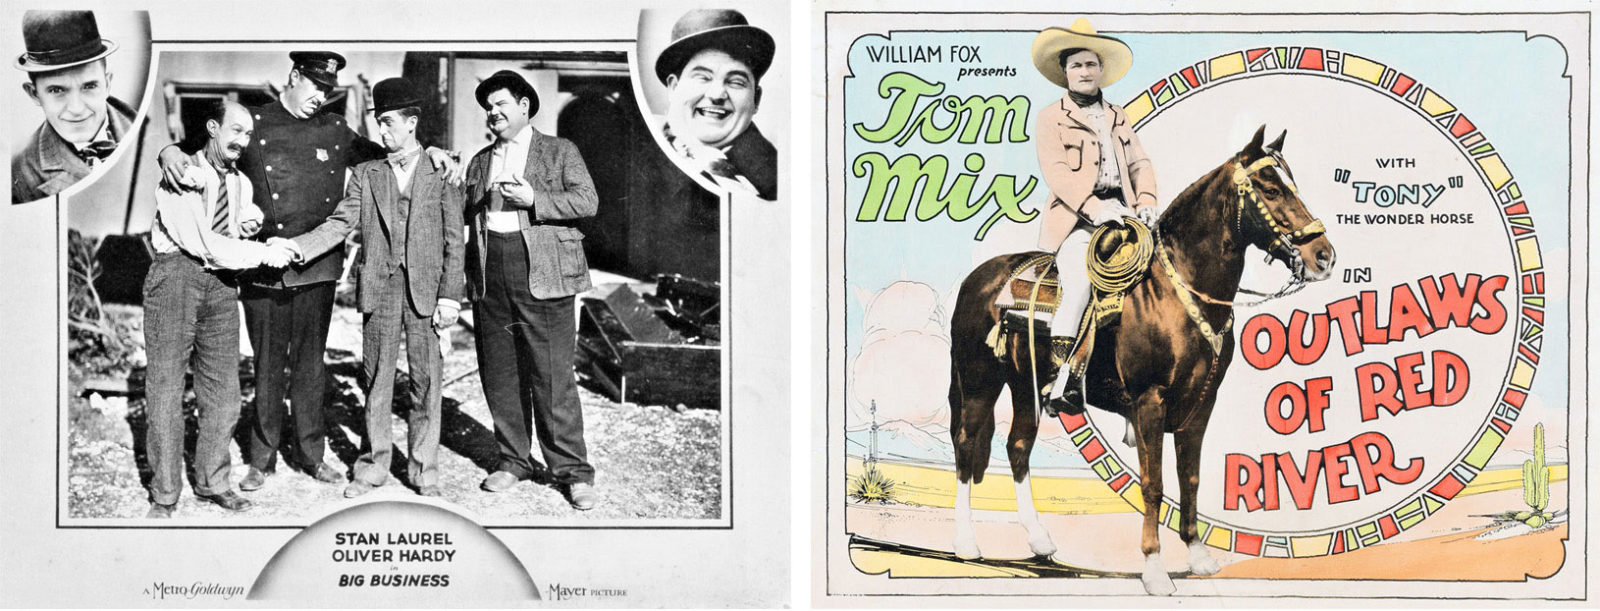 Ben Model silent film shows 2019